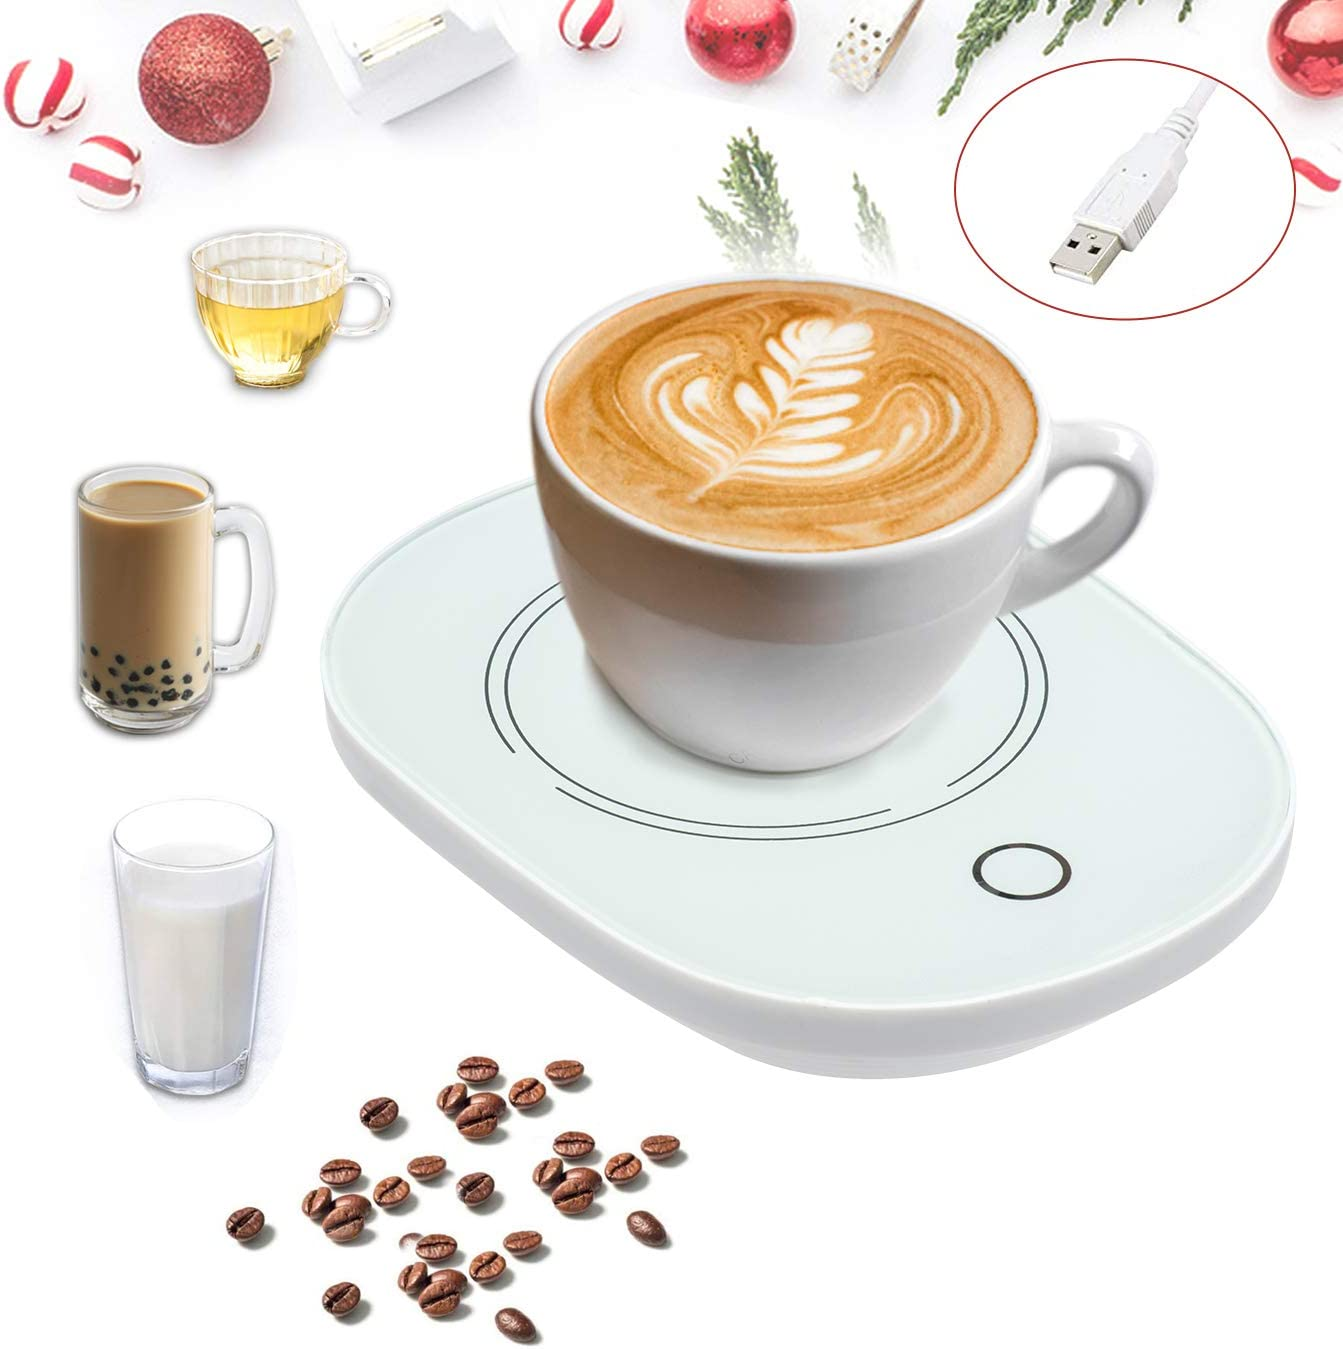 USB Coffee Cup Mug Warmer for Desk with Auto Shut Off,Coffee Mug Warmer USB for Desk Office Home